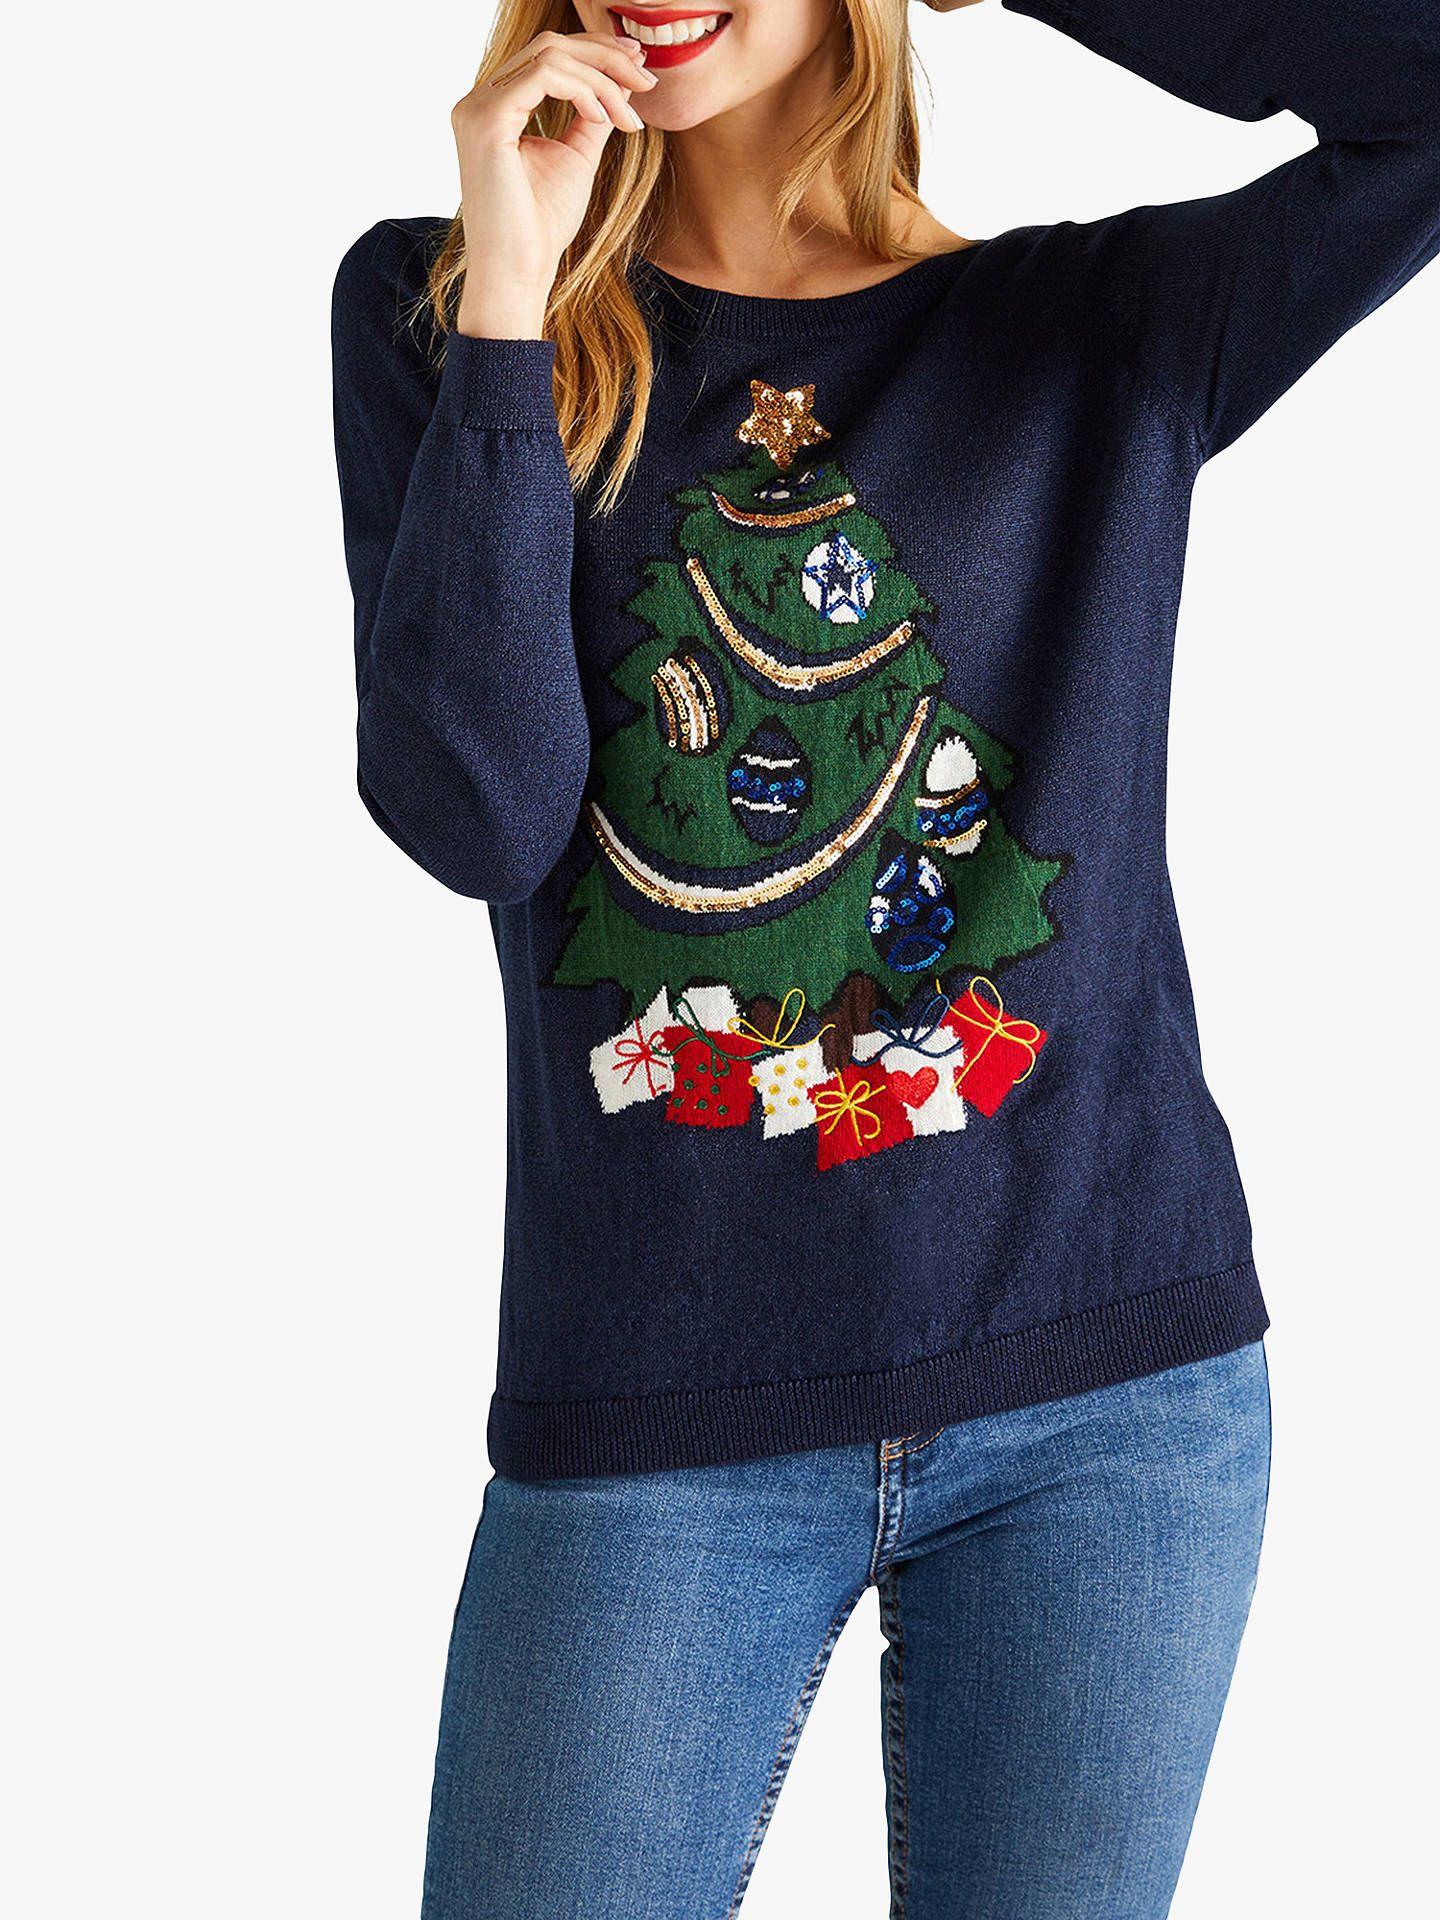 526f7763eb6 BuyYumi Embroidered Christmas Tree Jumper